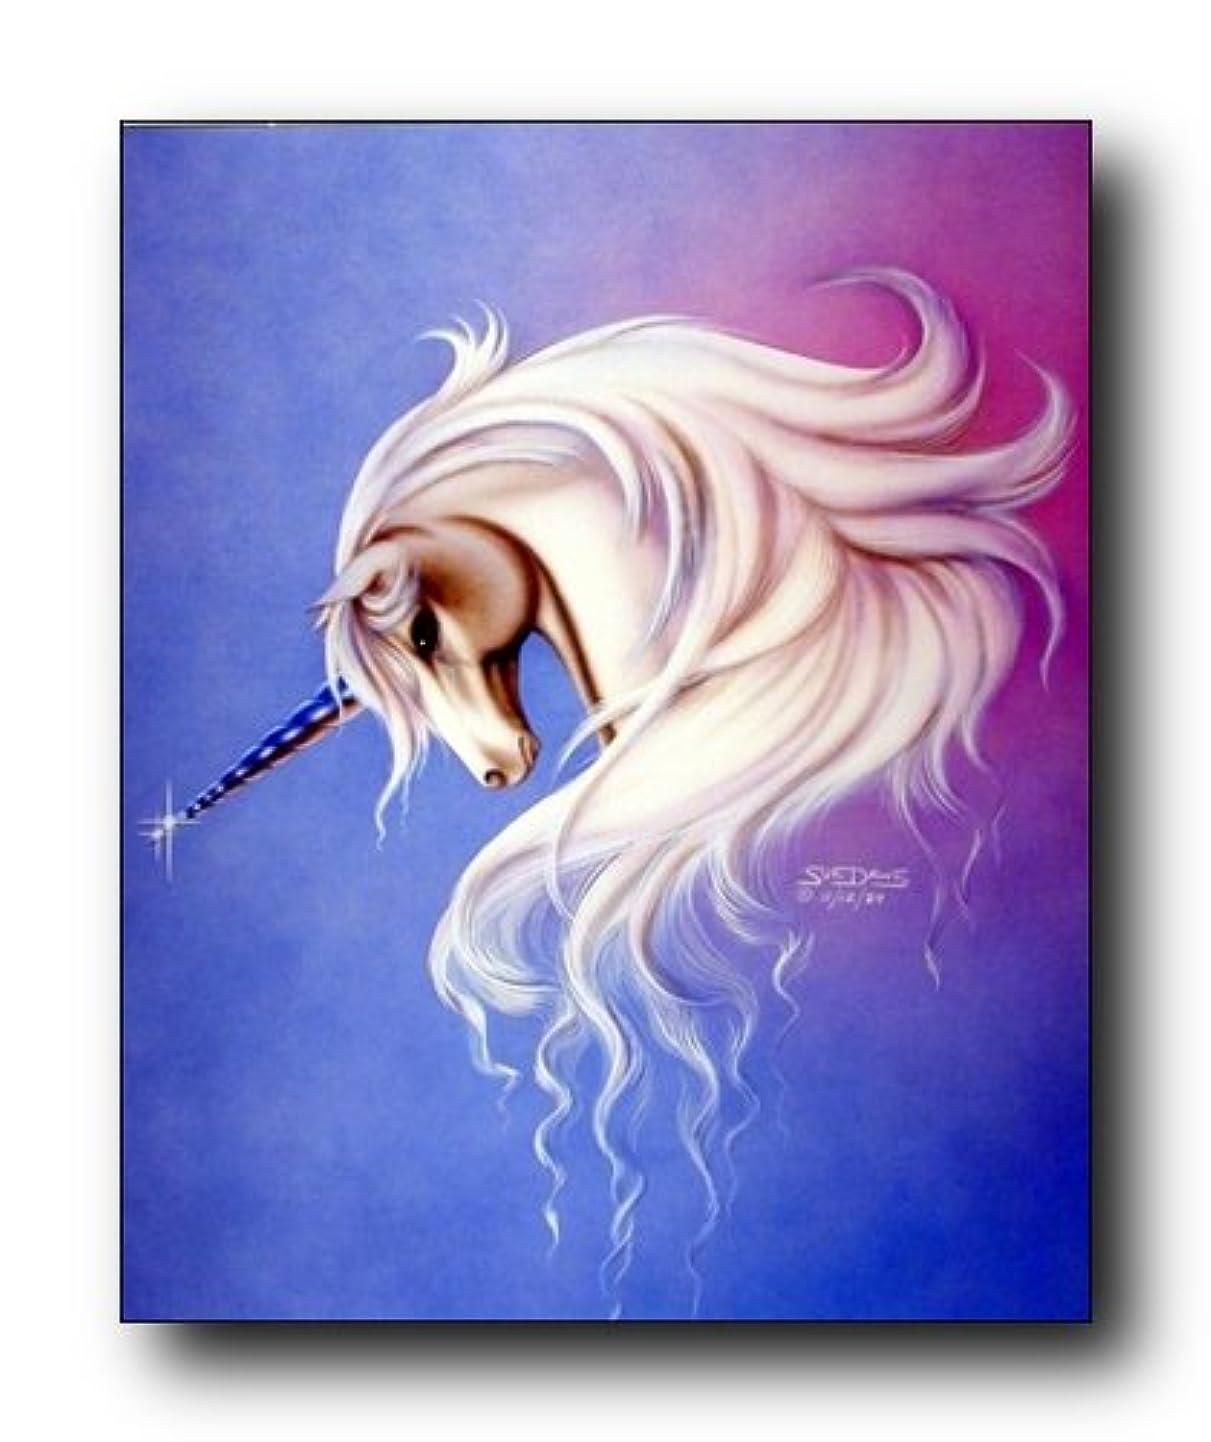 Mythical Lavender Mist Unicorn Sue Dawe Fantasy Home Decor Art Print Poster (16x20) lxyiuhweewf8